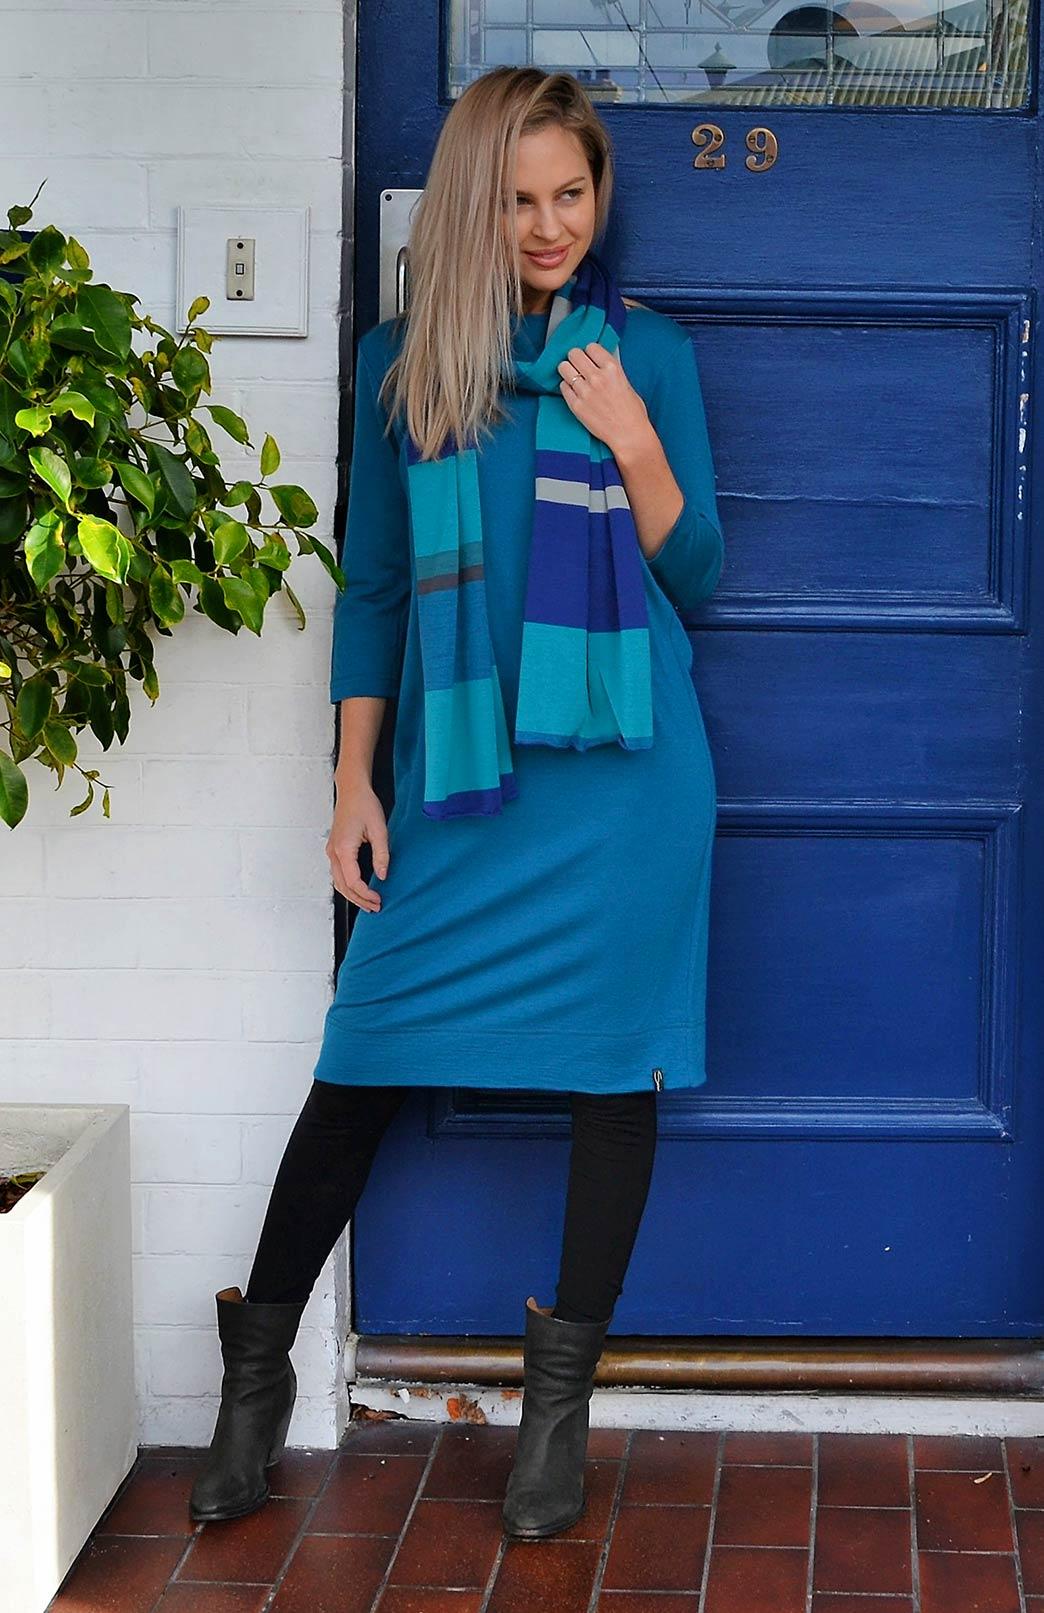 Audrey Shift Dress - Women's Teal Merino Wool Classic Knee Length Dress - Smitten Merino Tasmania Australia